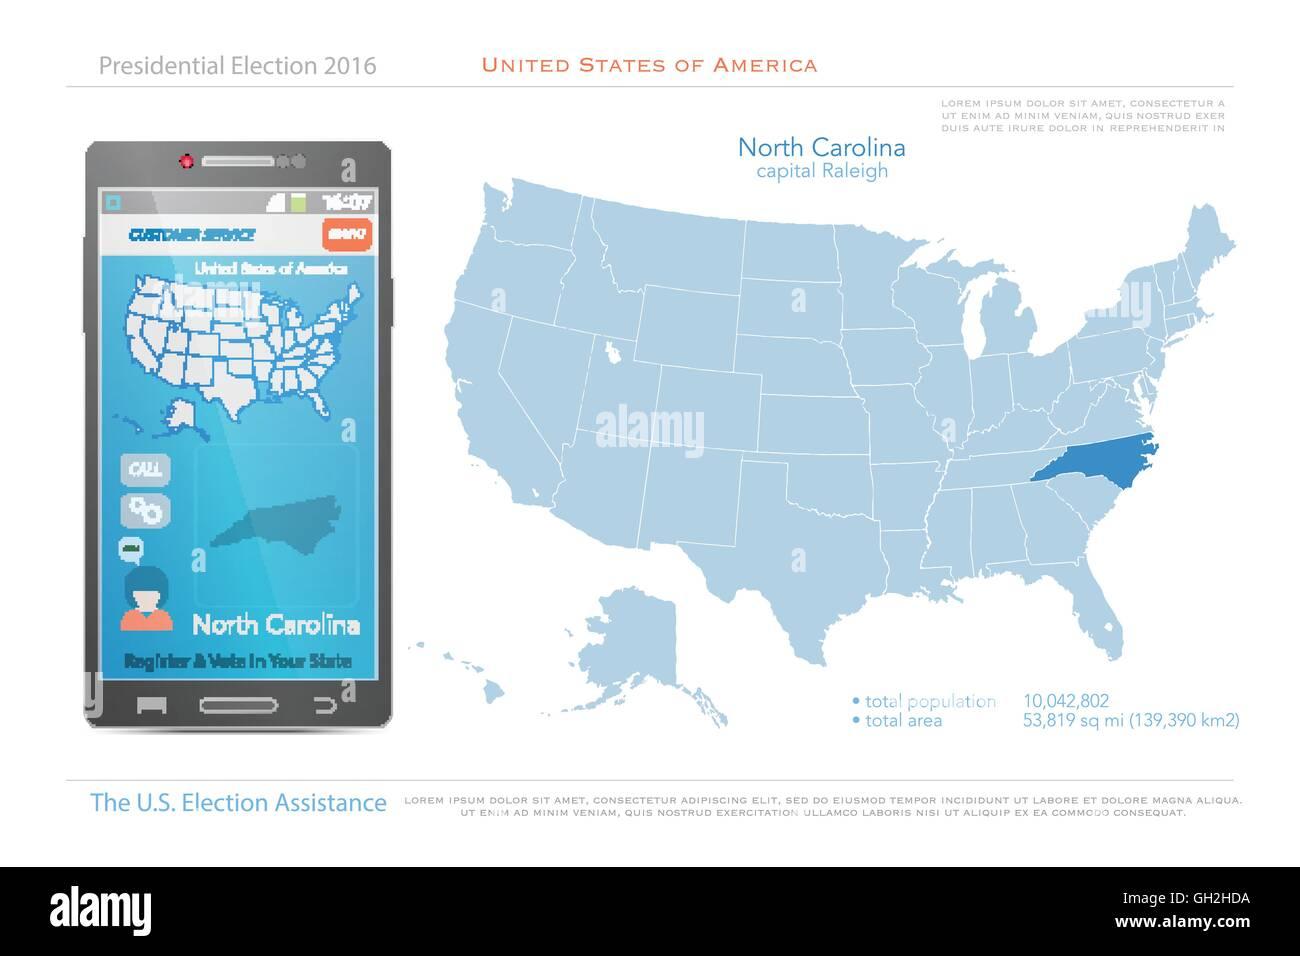 United States Of America Maps And North Carolina State Territory - North-carolina-map-us